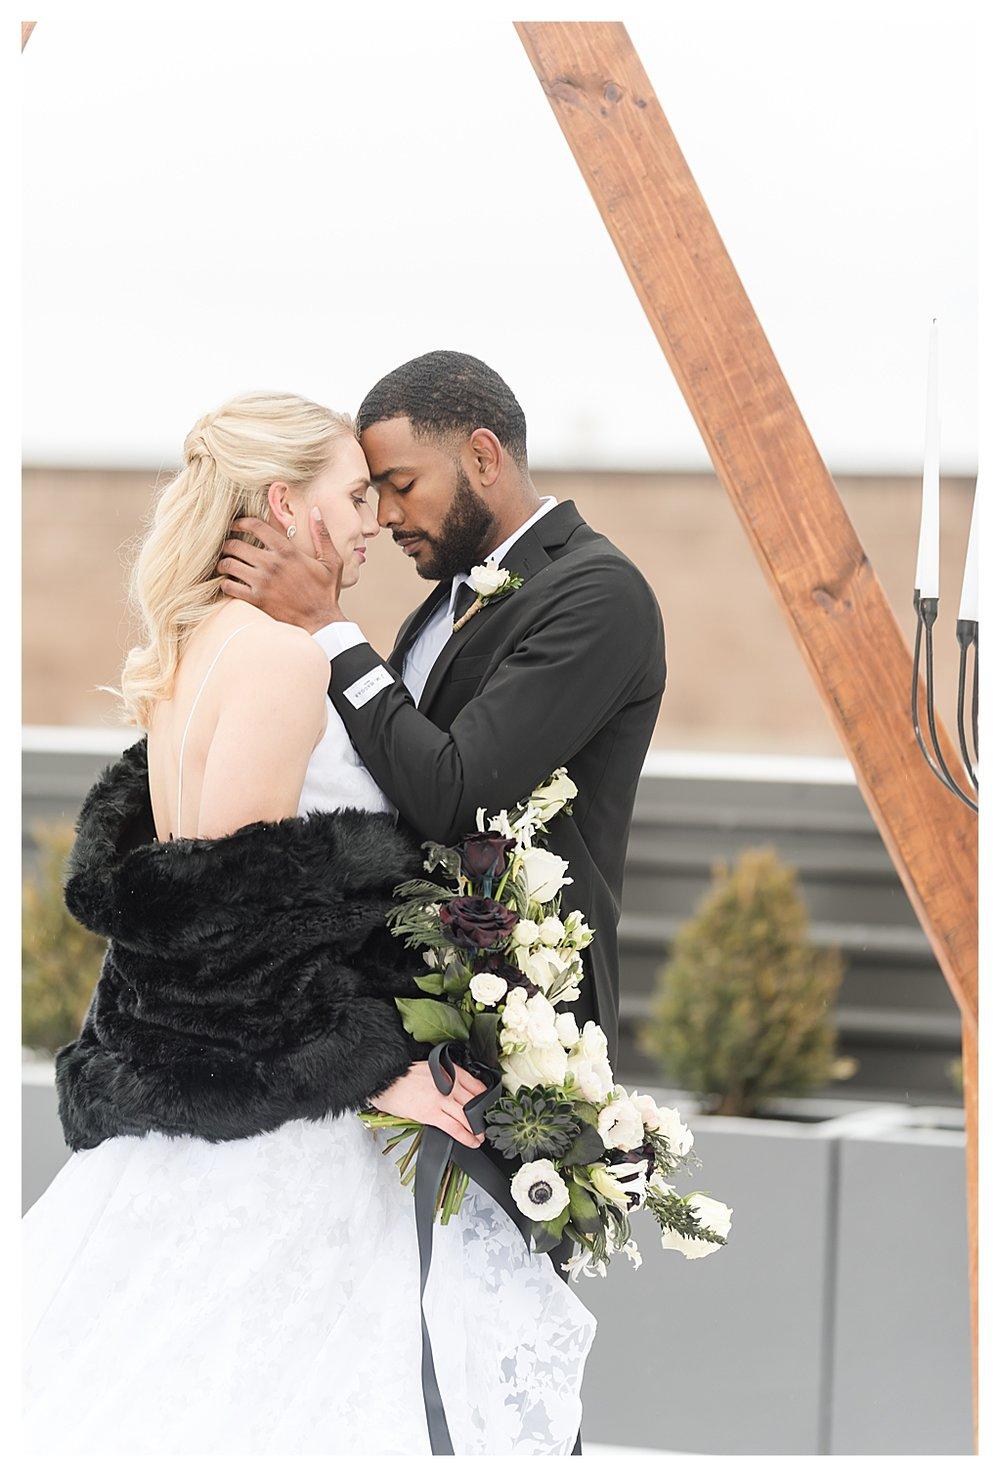 Elegant Black and White Winter Rooftop Wedding_0816.jpg